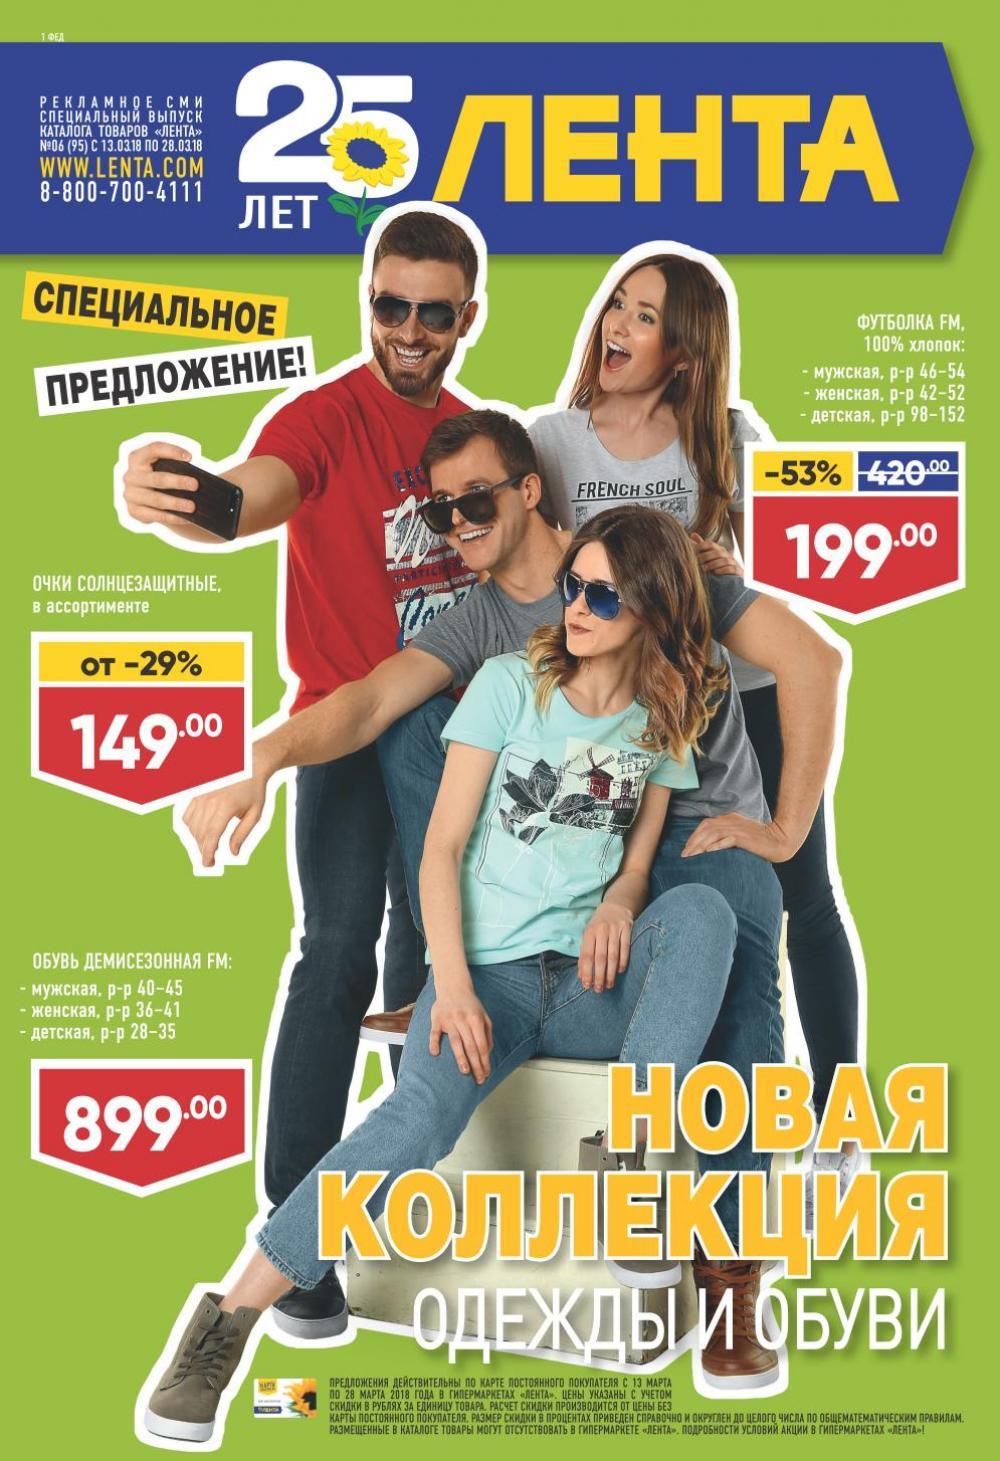 Каталог одежды магазин Лента, весна 2018